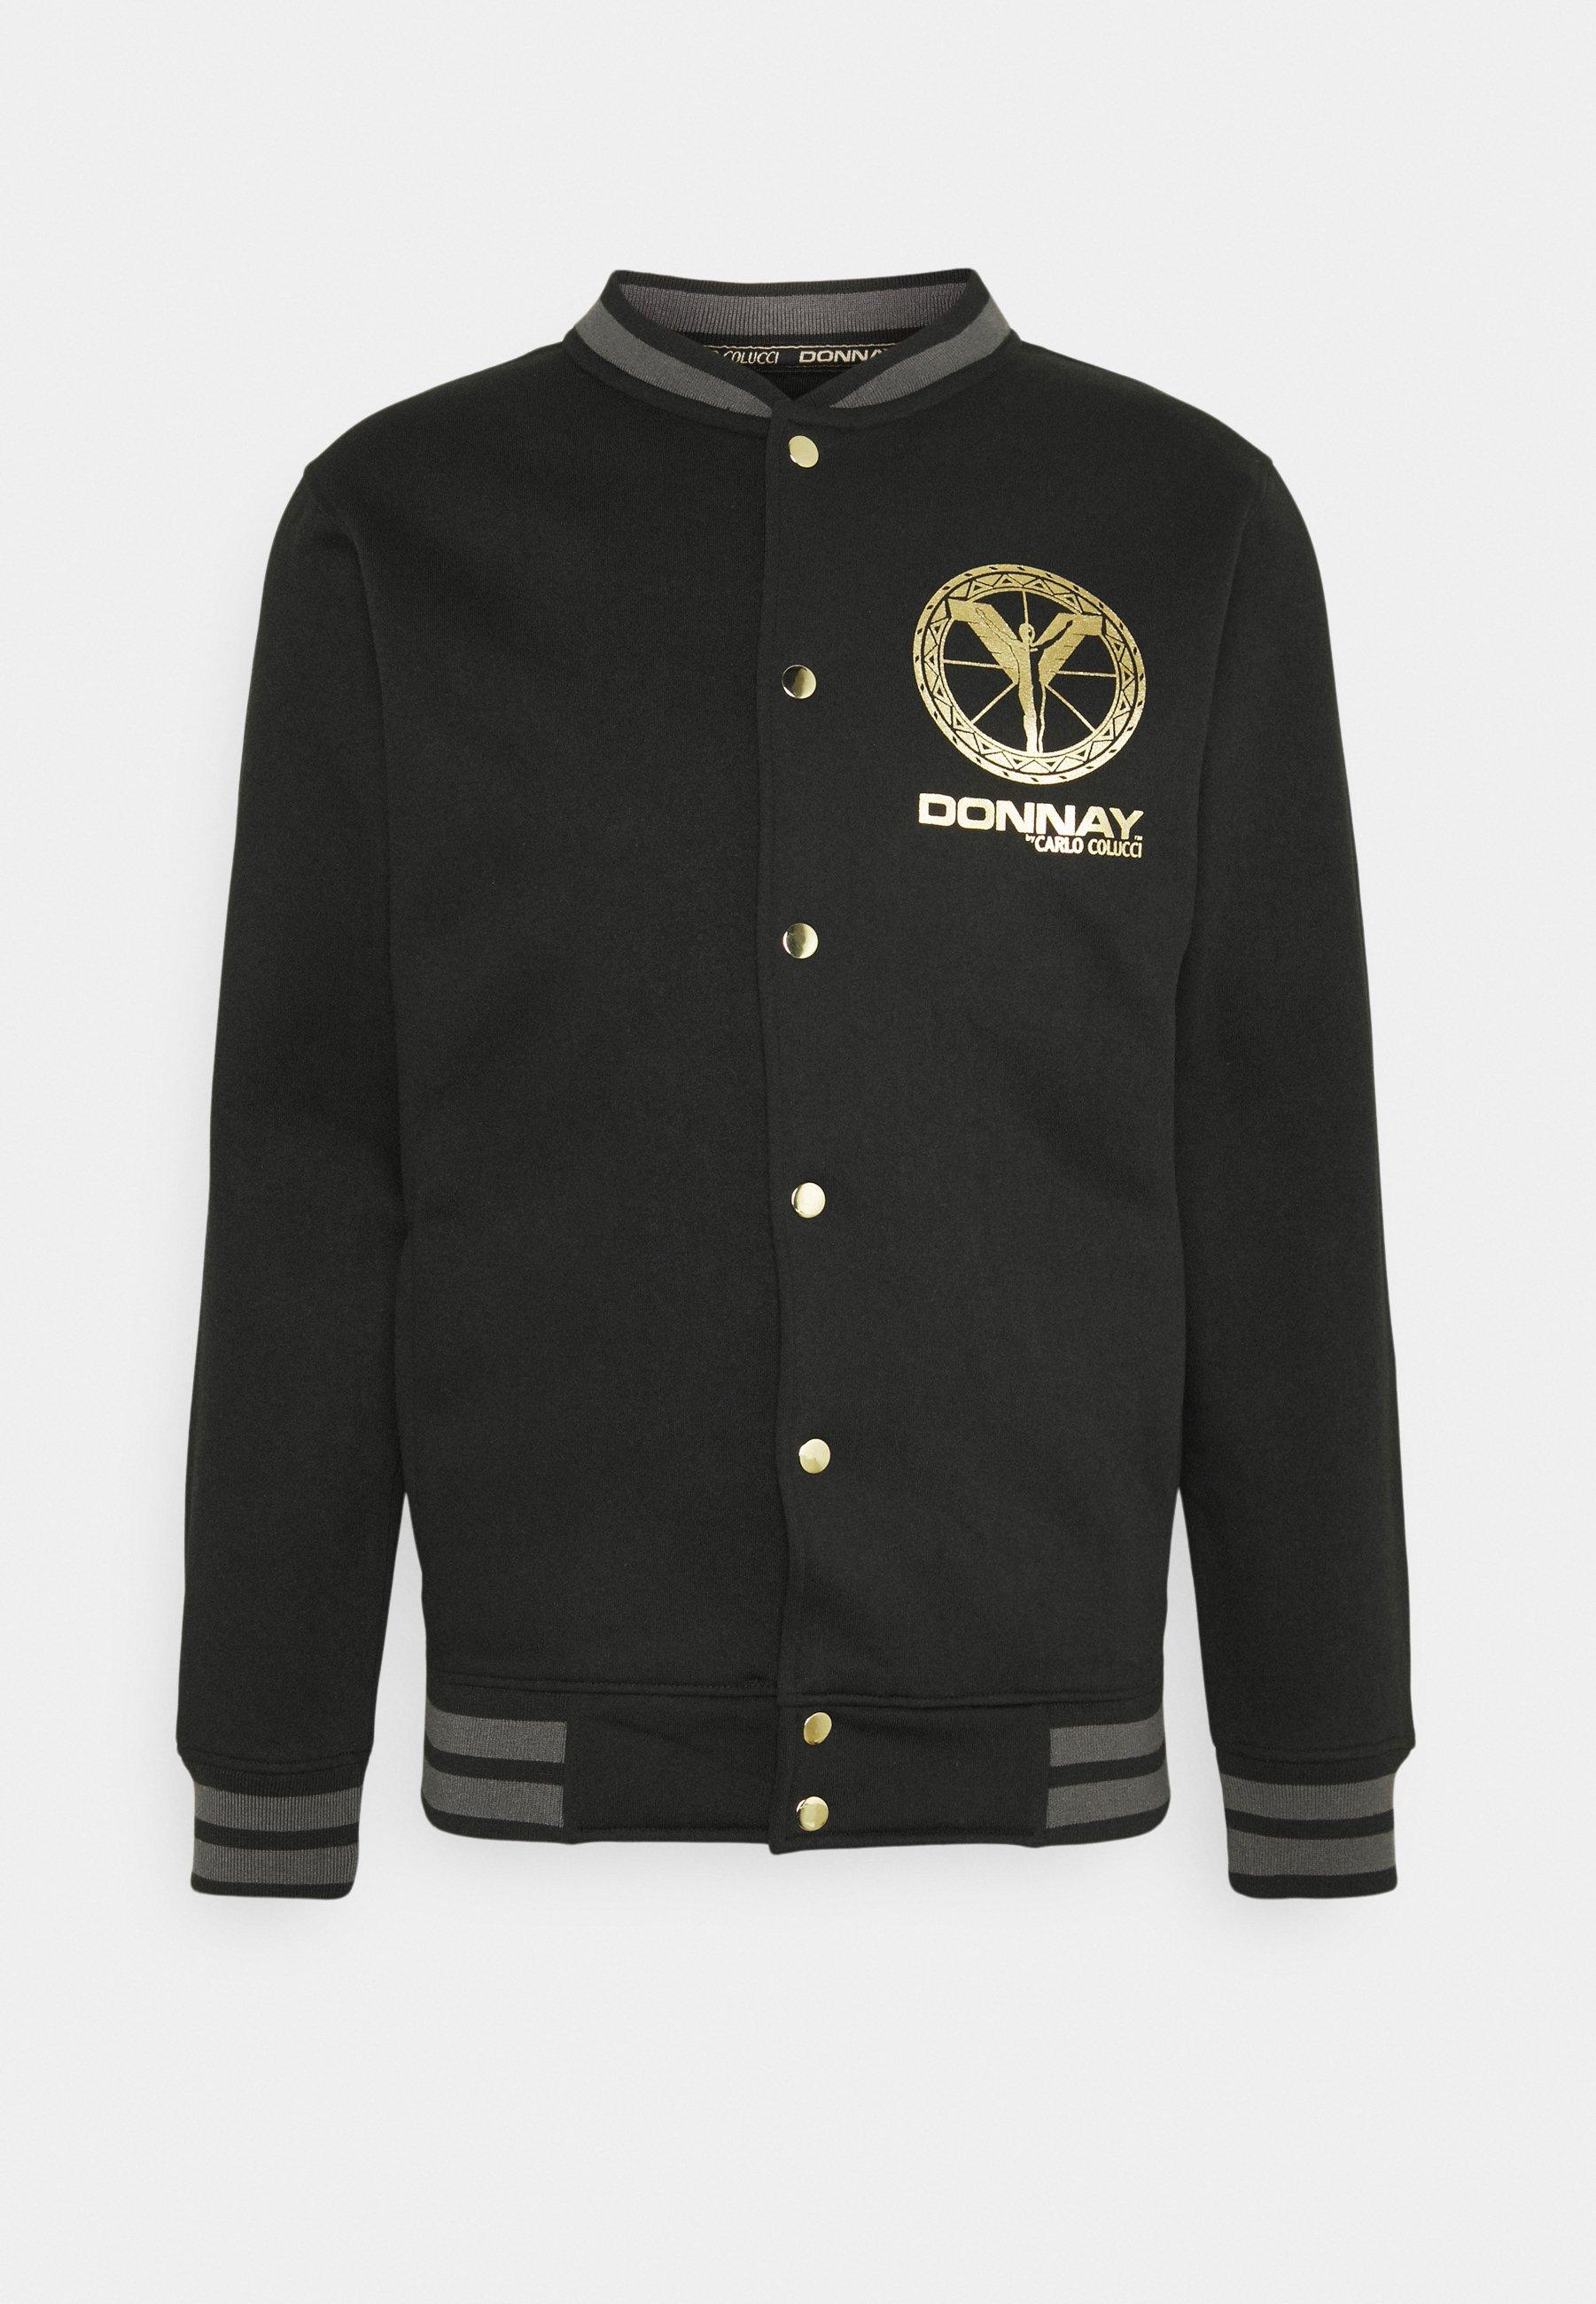 Men DONNAY X CARLO COLUCCI - Bomber Jacket